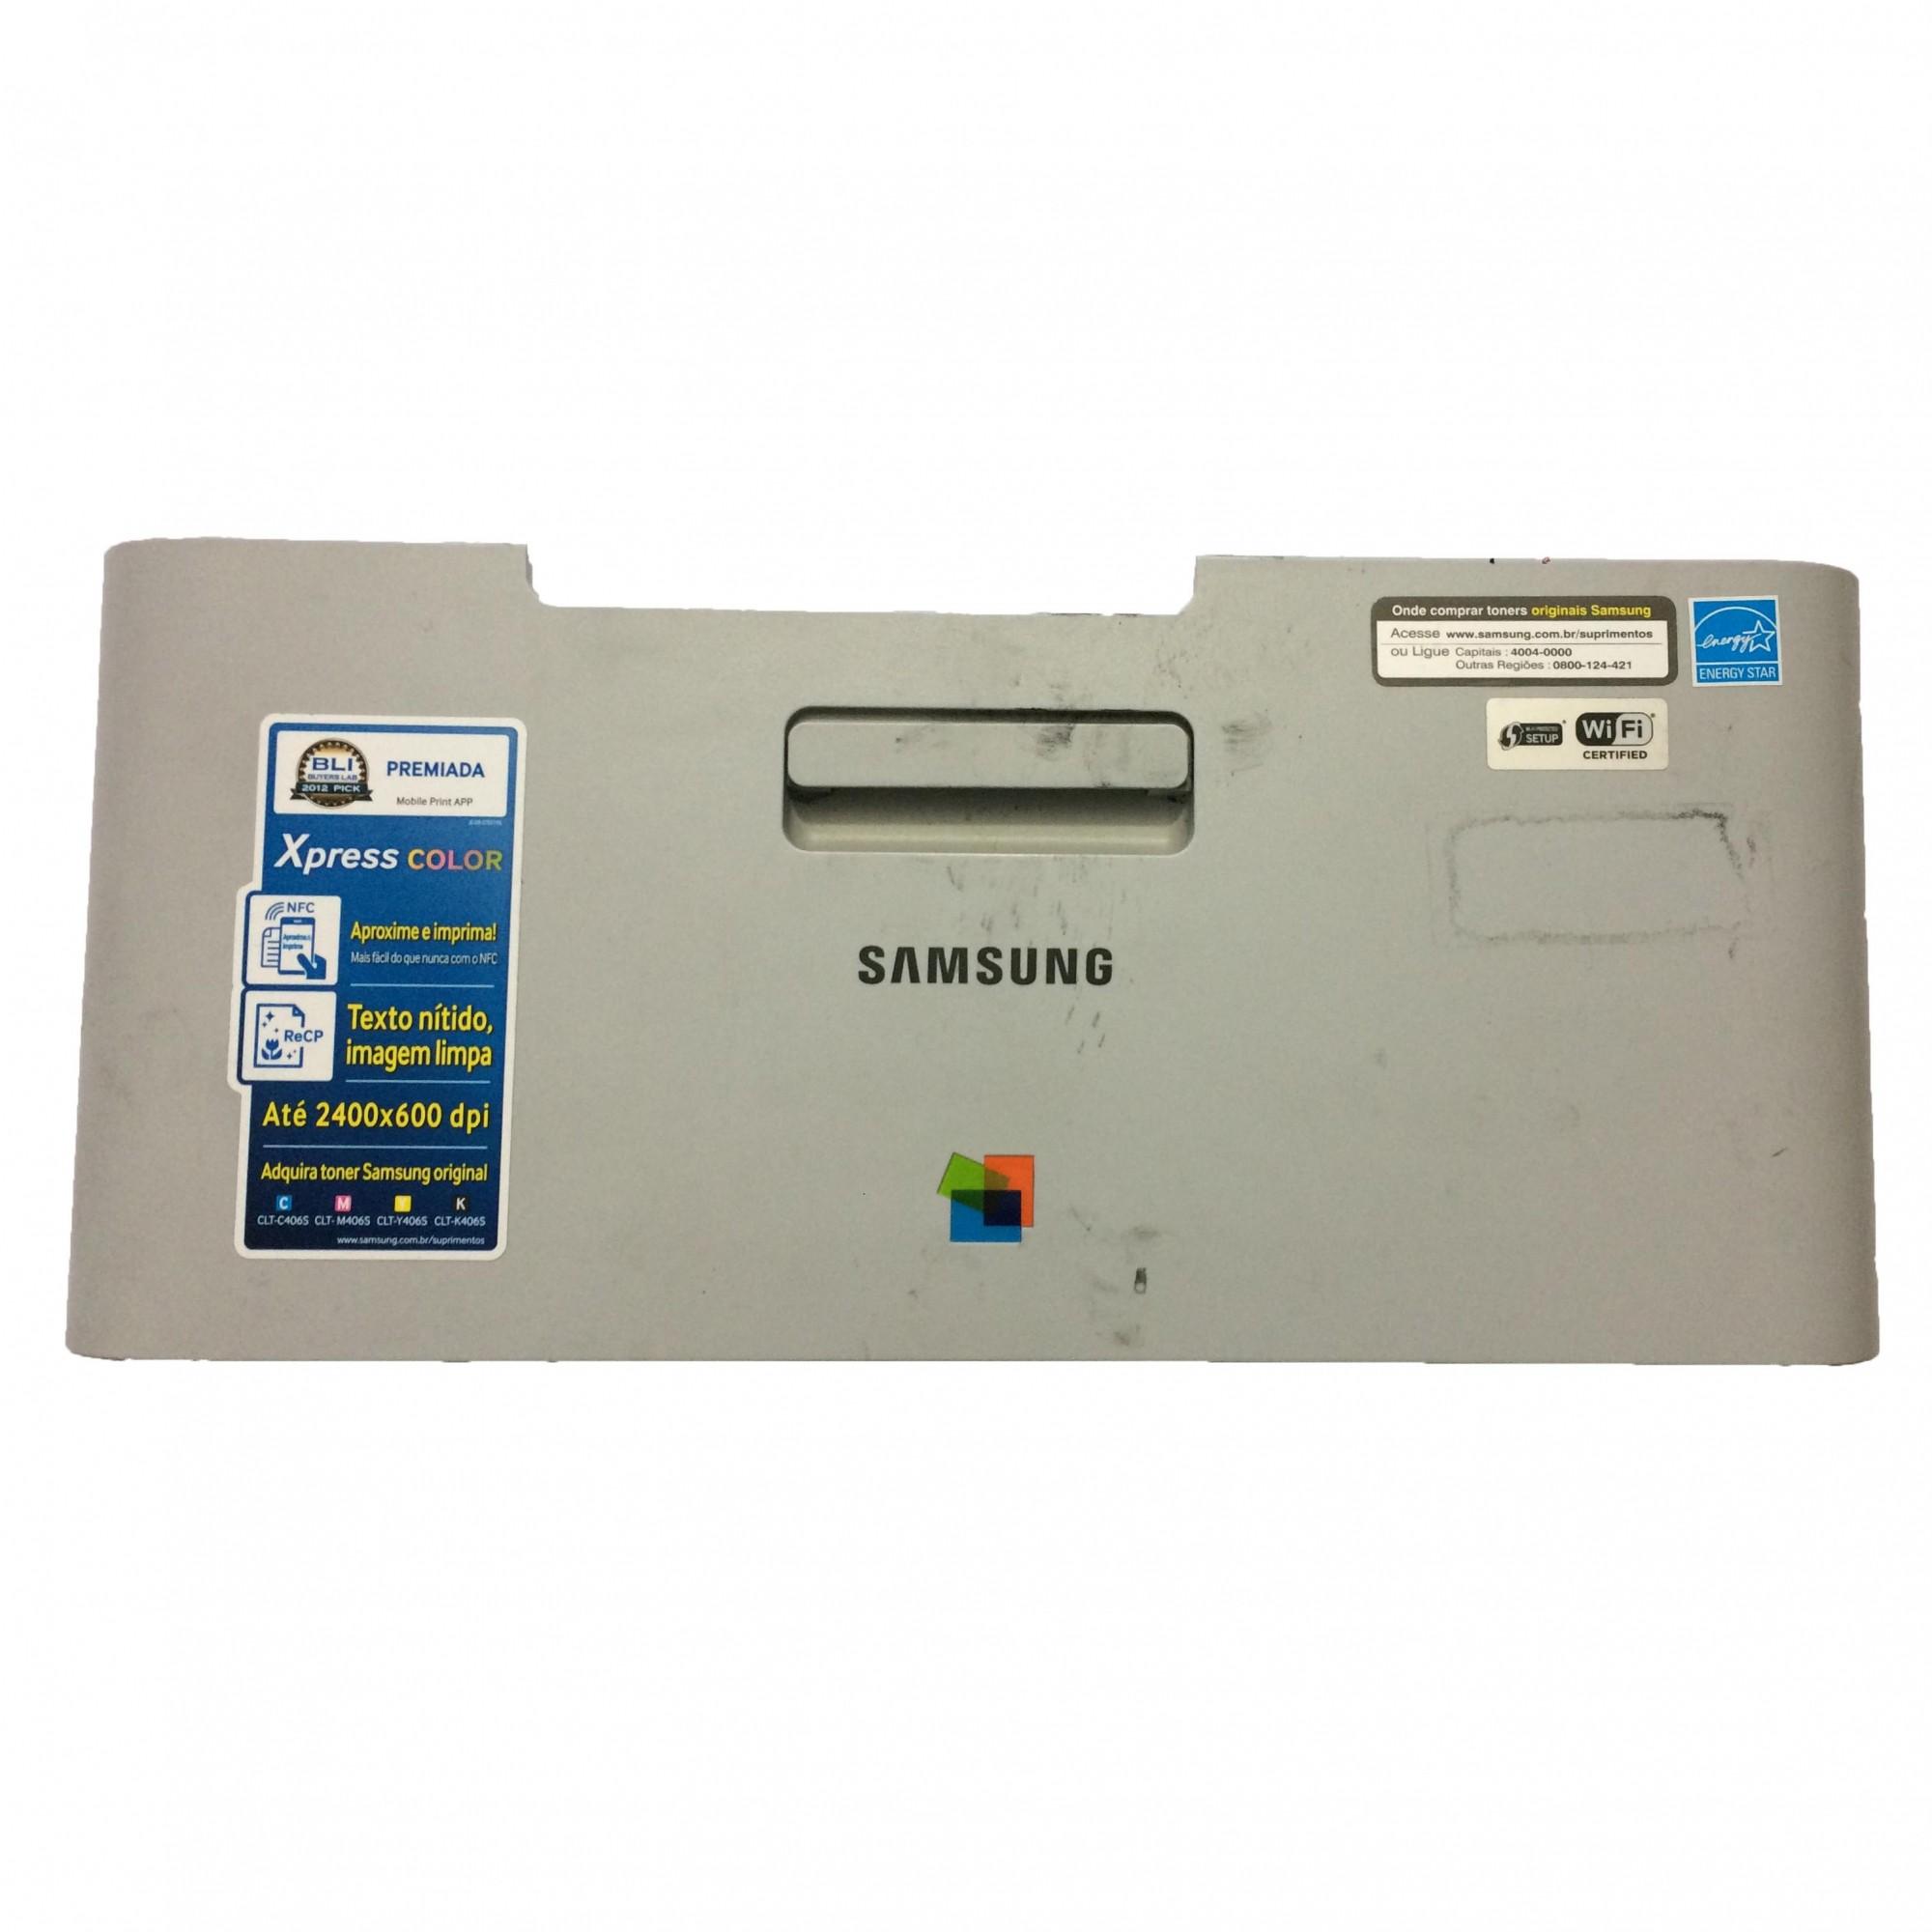 Tampa Frontal Multifuncional Samsung C460fw Clx-3305w (ml56) PN: Jc63-03847a - Retirado